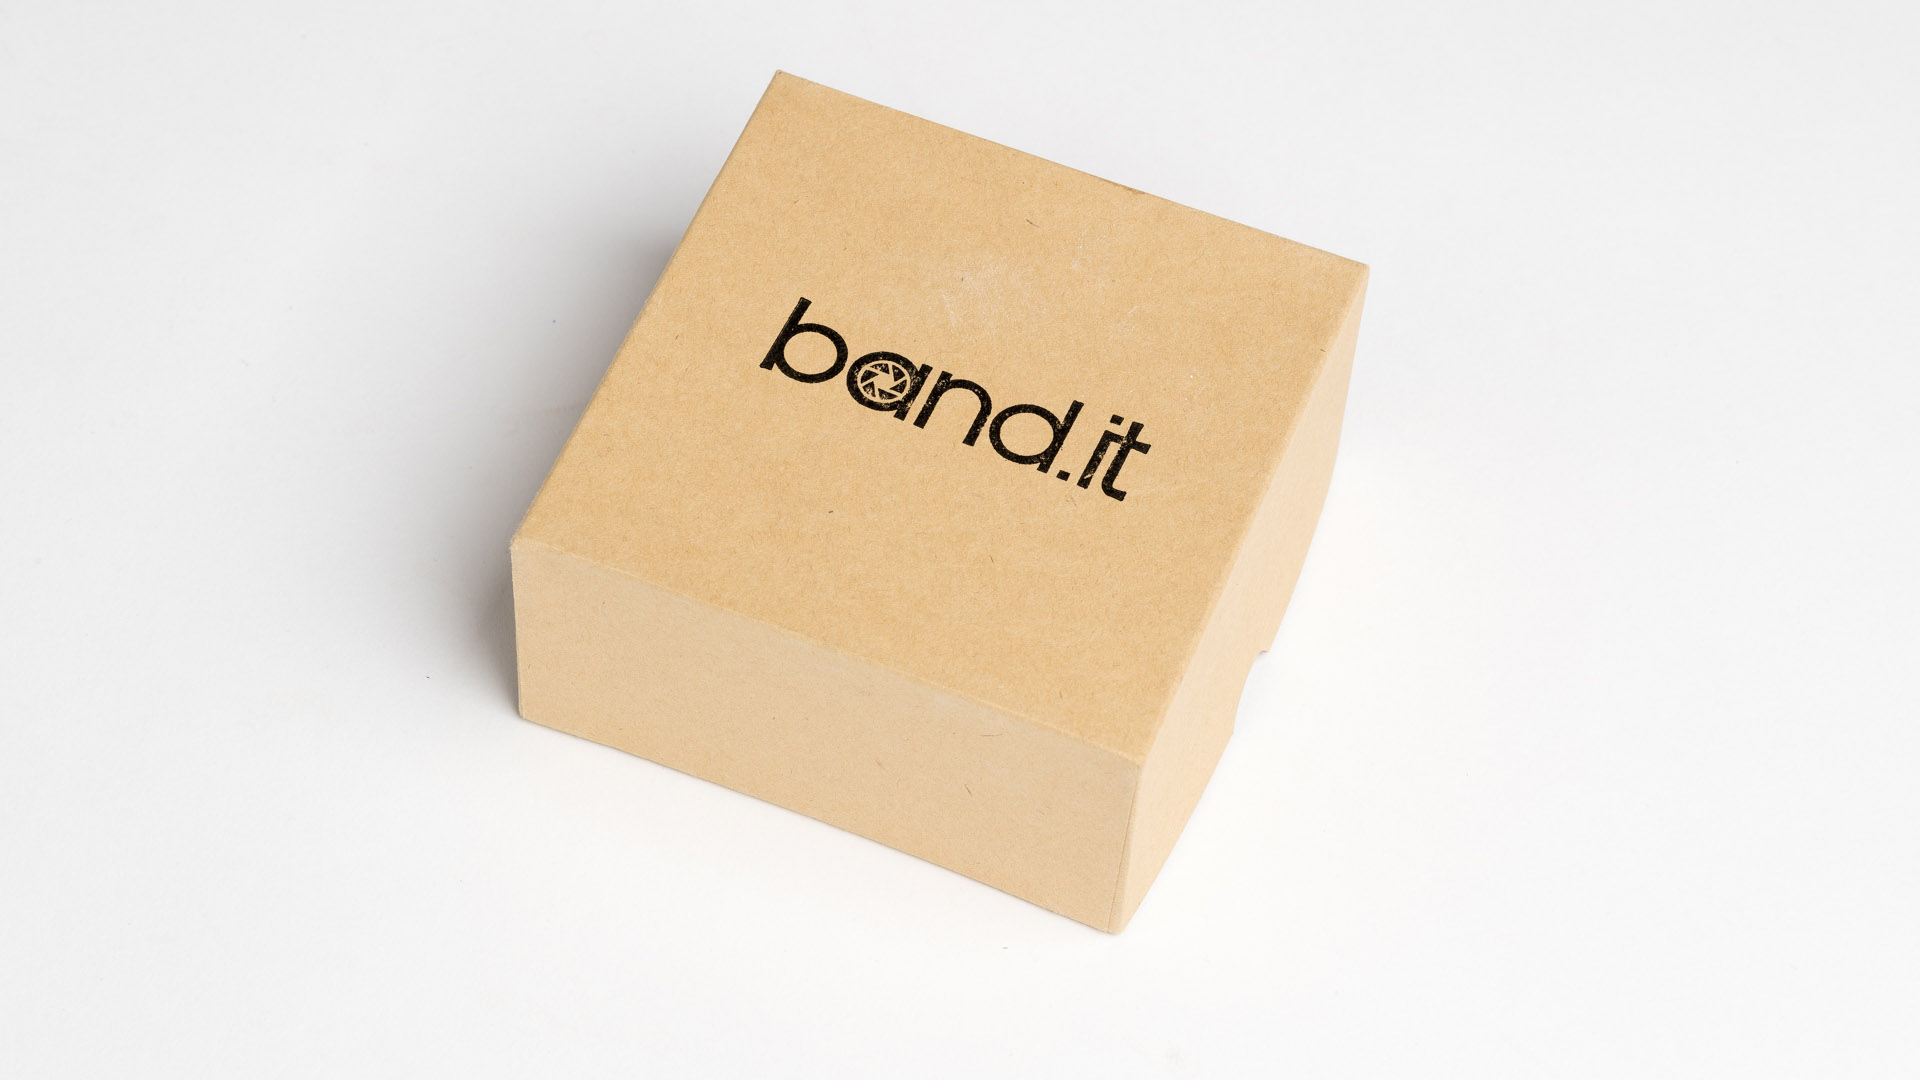 The band.it box